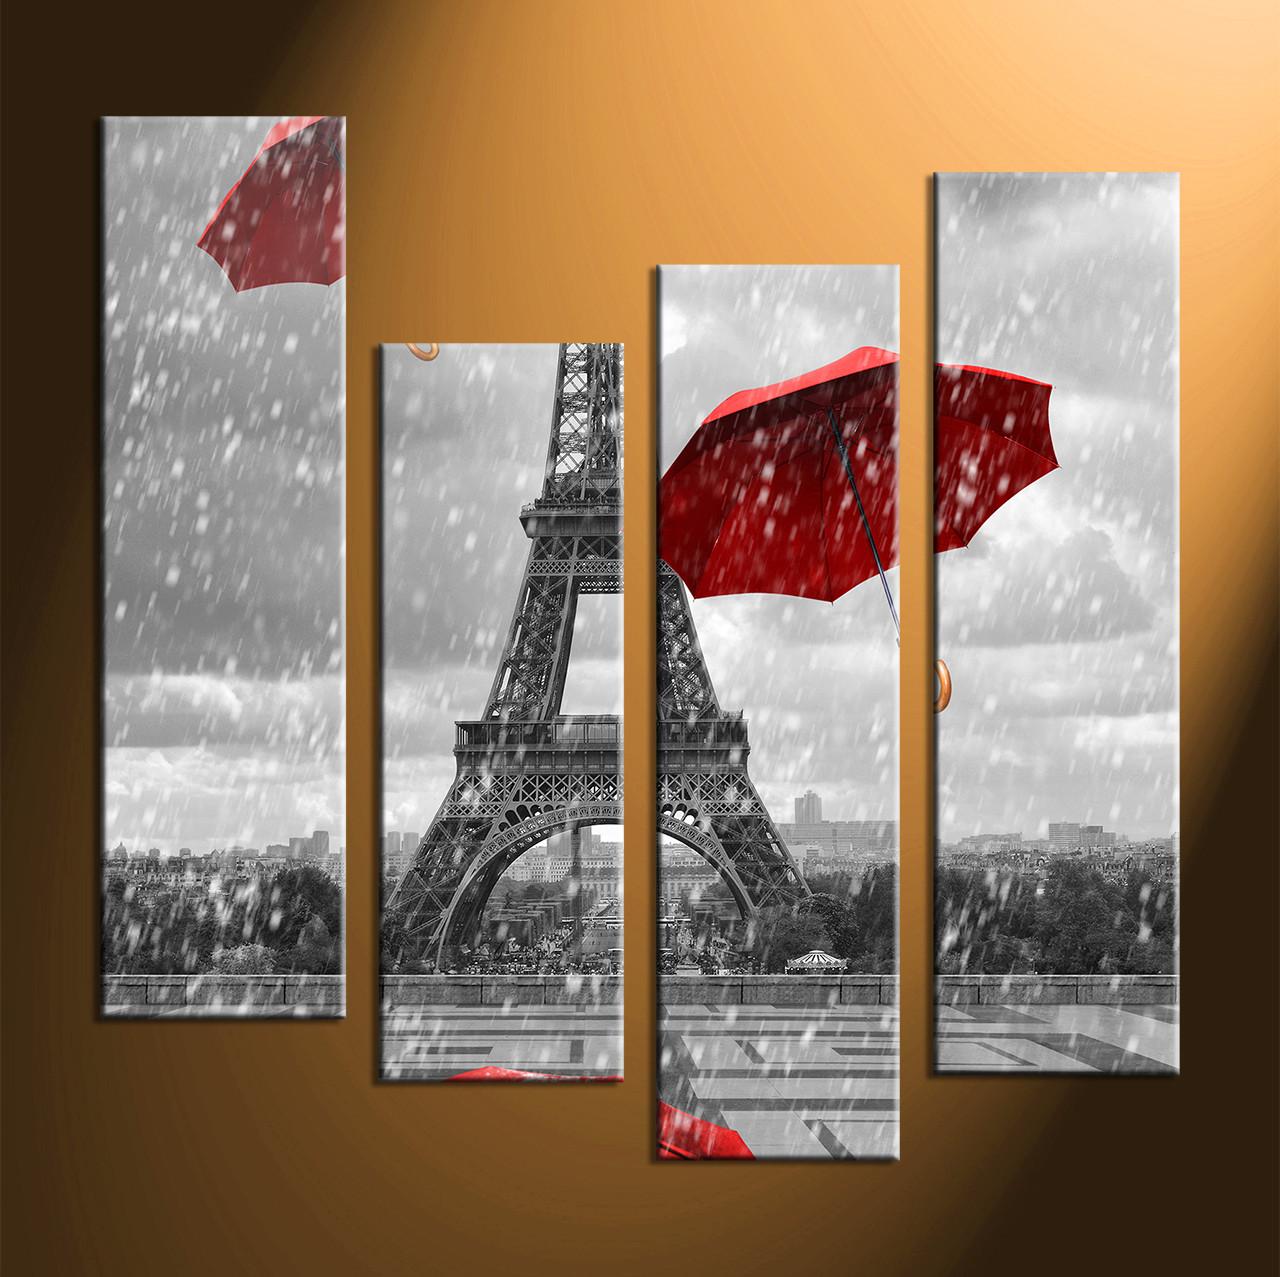 4 piece wall art metal home decor piece wall art umbrella panel art eiffel tower art pictures red umbrella black and white multi panel art